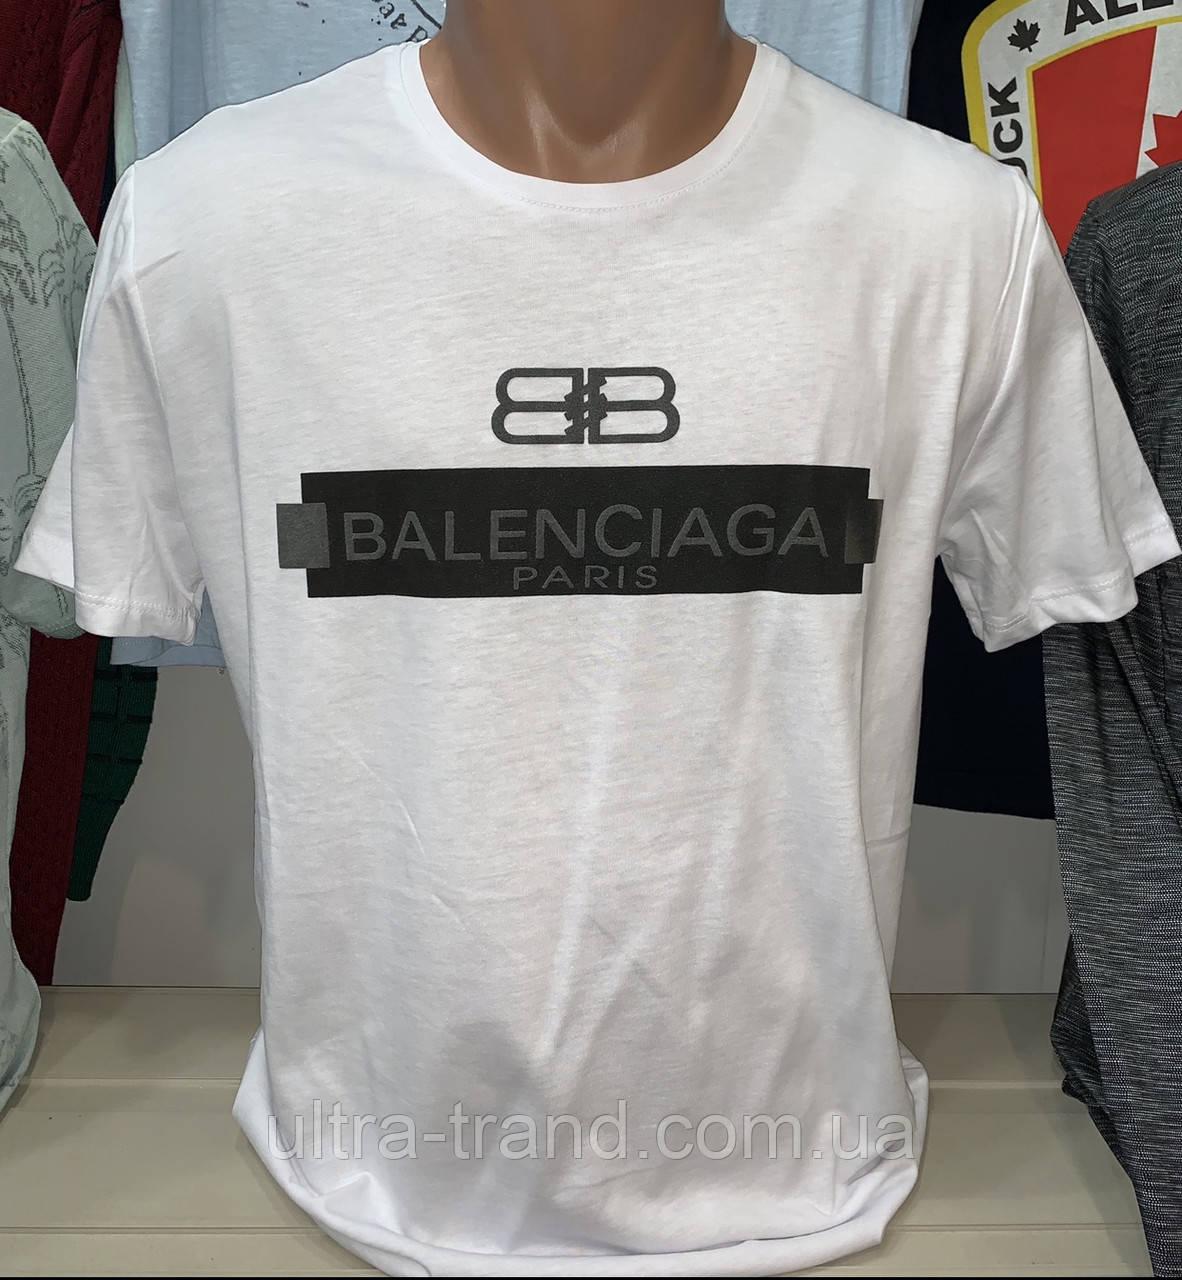 fd7fb20e83e5b Мужские турецкие брендовые футболки Balenciaga хлопок - Интернет магазин  Ultra-Trend в Харькове